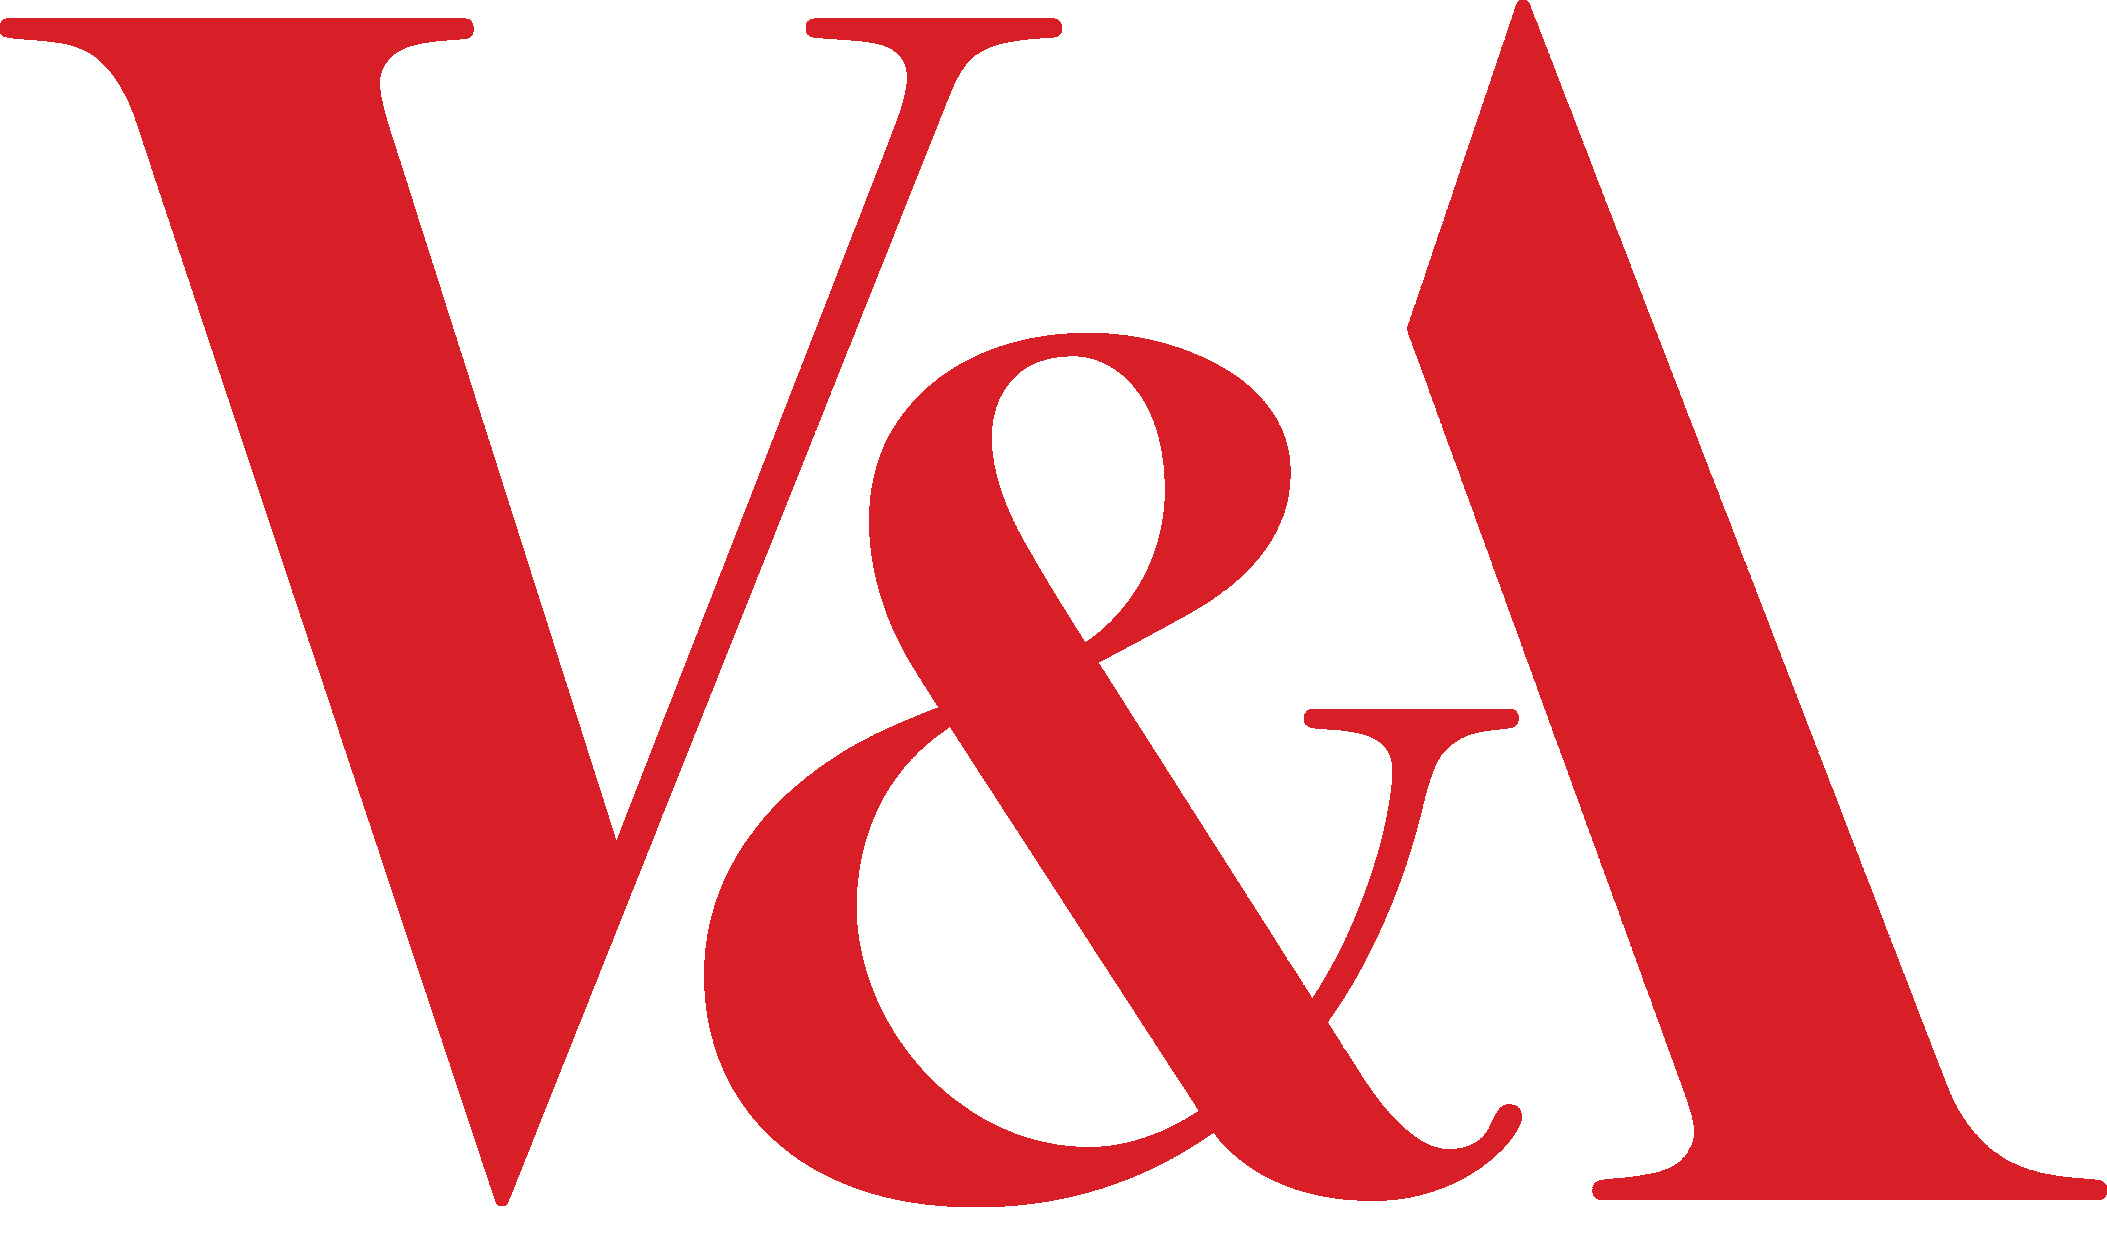 VA-logo-Open_Create_Creative-Away_Day_Client_Anna_B_Sexton.jpg